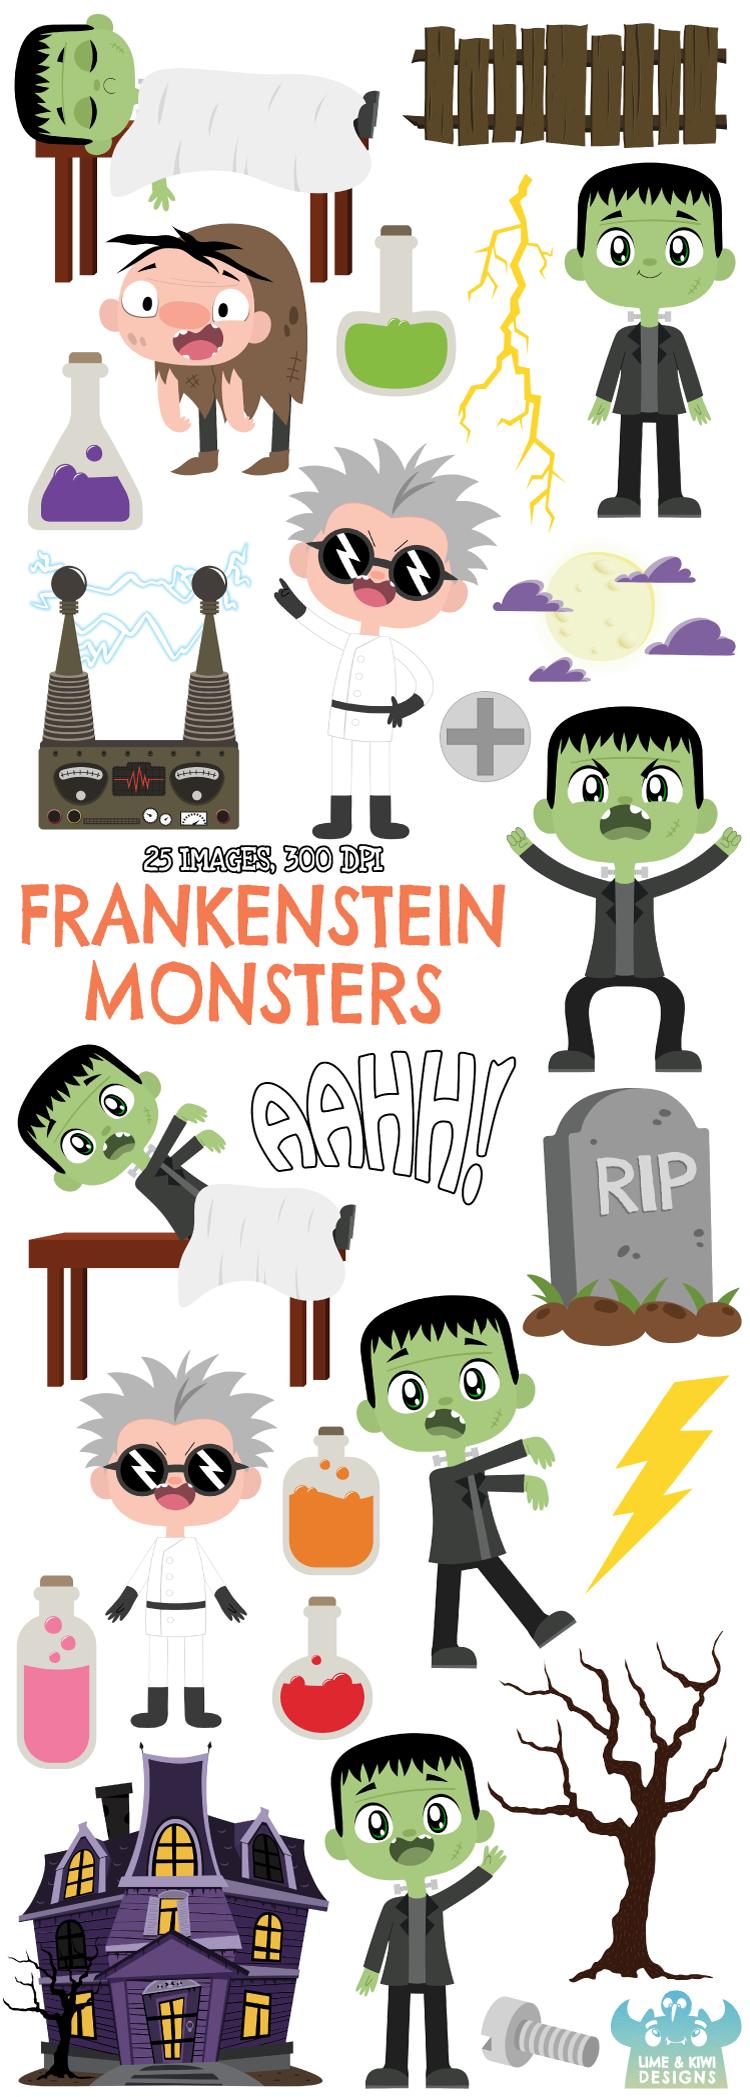 Frankenstein S Monster Clipart Lime And Kiwi Designs Monster Clipart Clip Art Frankenstein S Monster